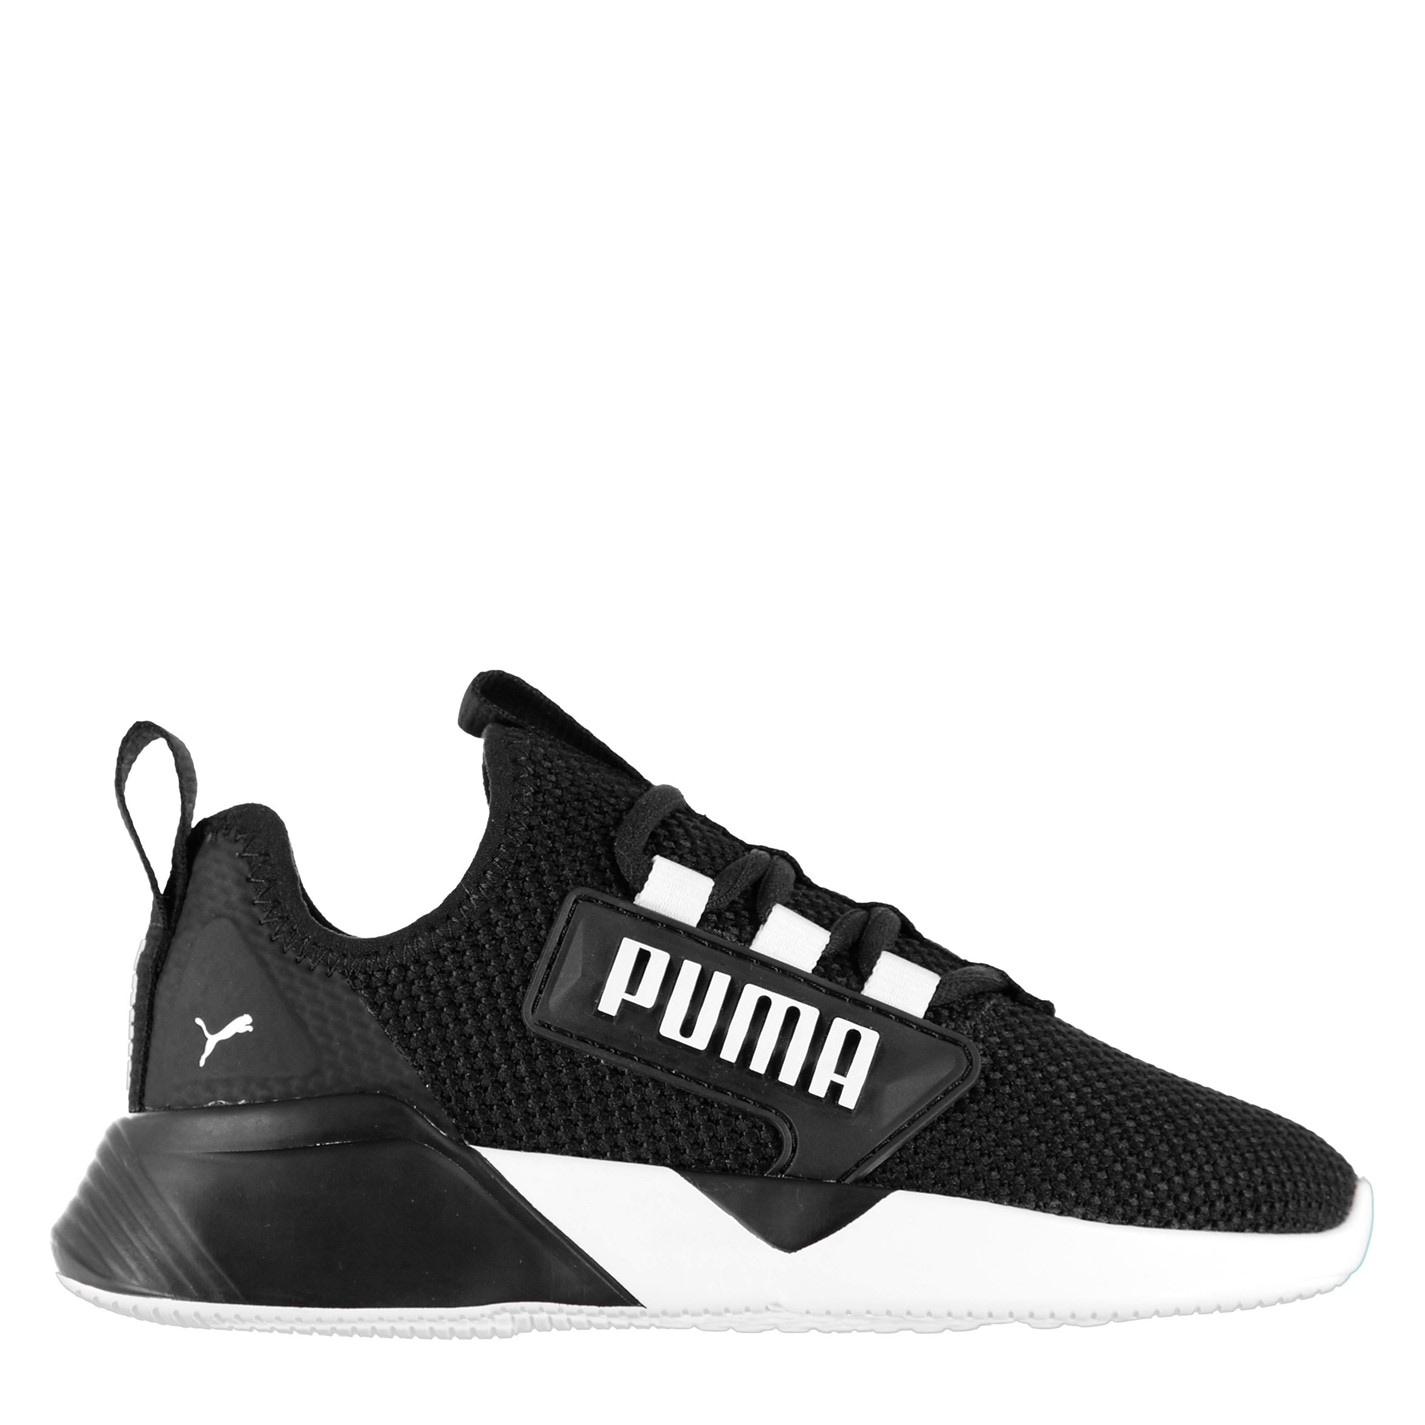 Puma Retaliate Child Boys Trainers Black/White